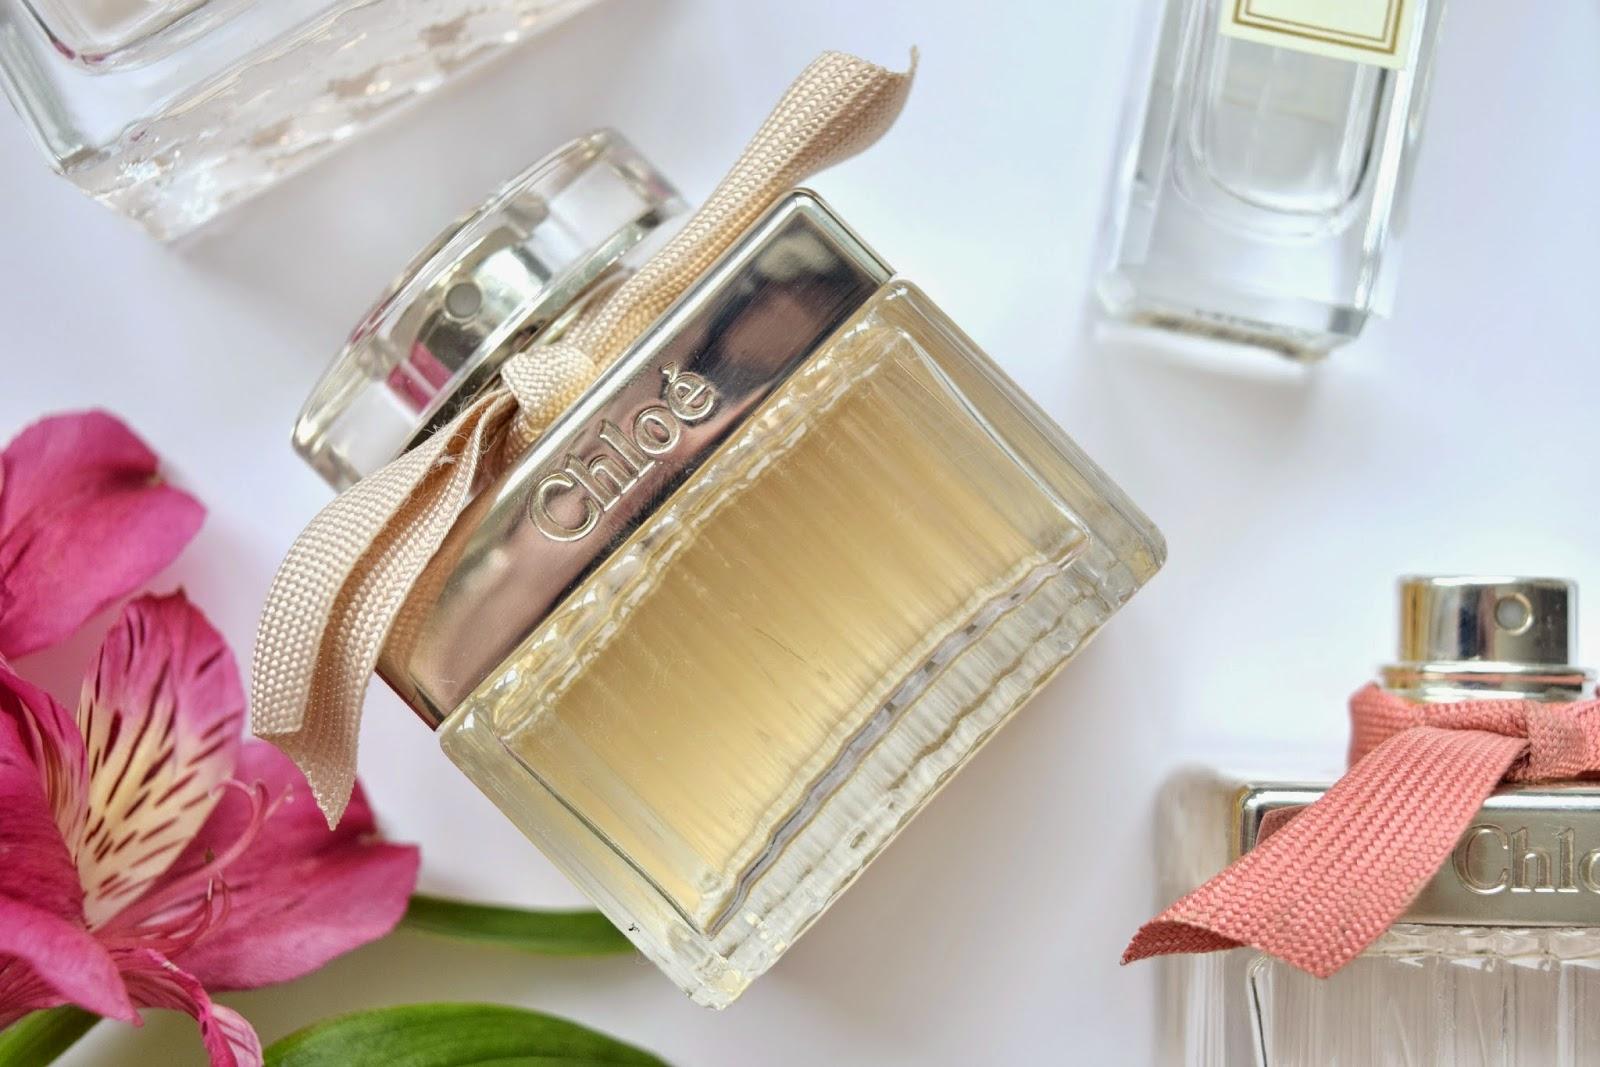 Perfume, Reviews, Miss Dior, Chloe, Jo Malone, Eau De Perfume, Roses